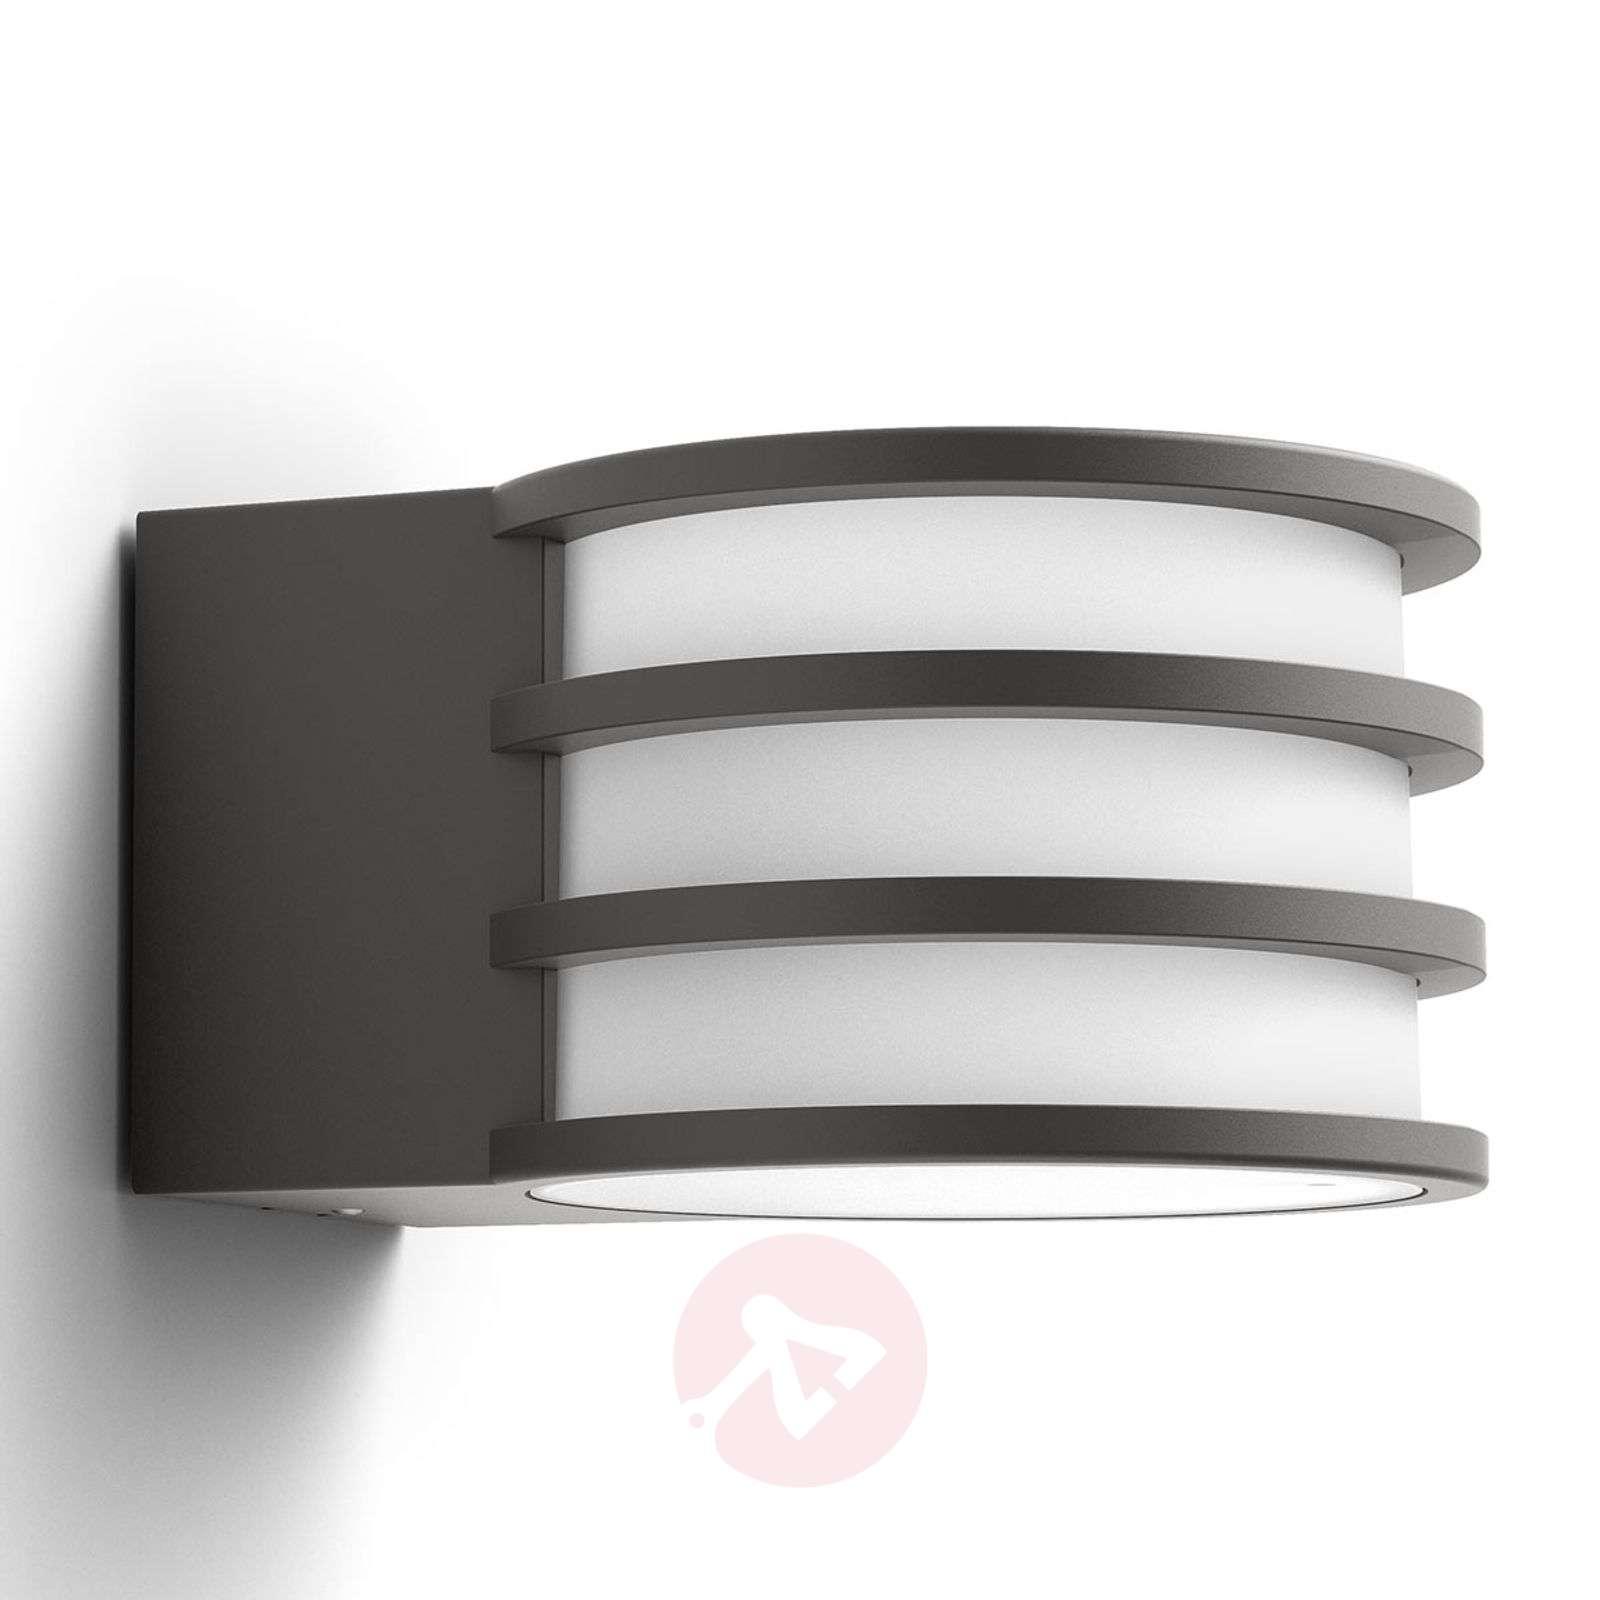 Philips Hue-LED-ulkoseinälamppu Lucca-7534048-01